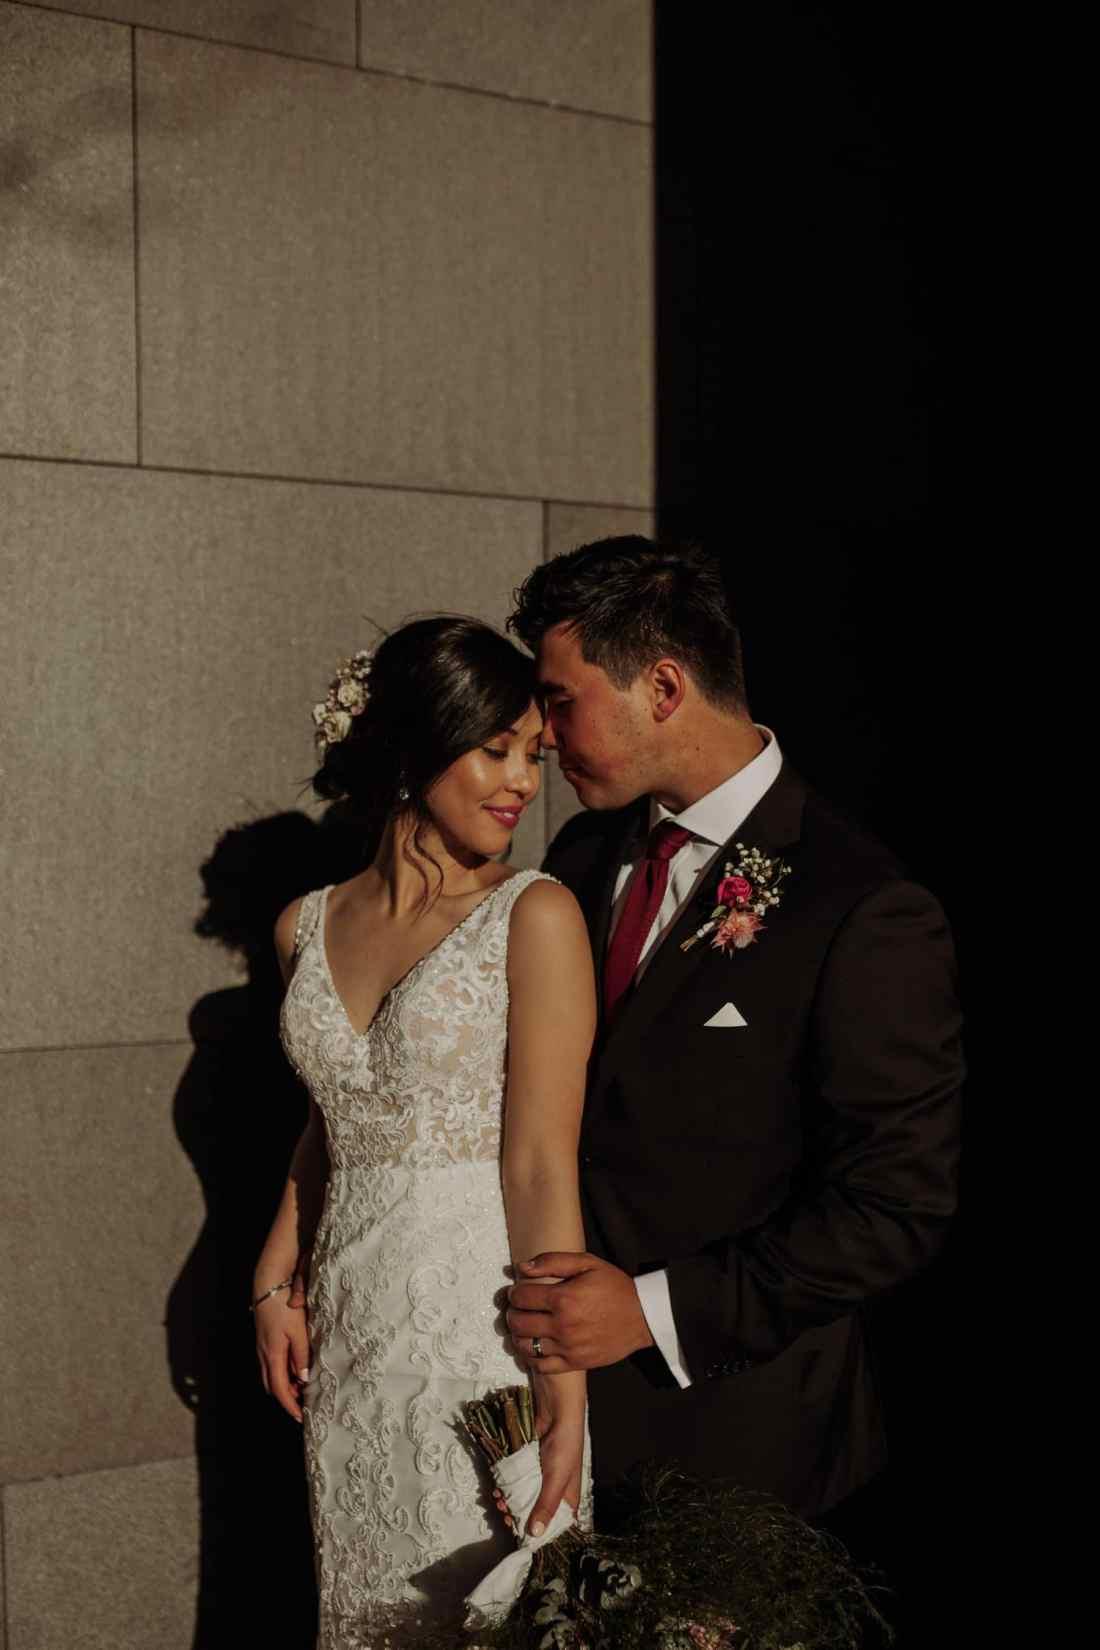 Ebony Blush Photography   Perth Wedding Photographer   Photography + Film   Sandalford Winery   Como Treasury Wedding   Perth City Wedding  Alex + Mel86